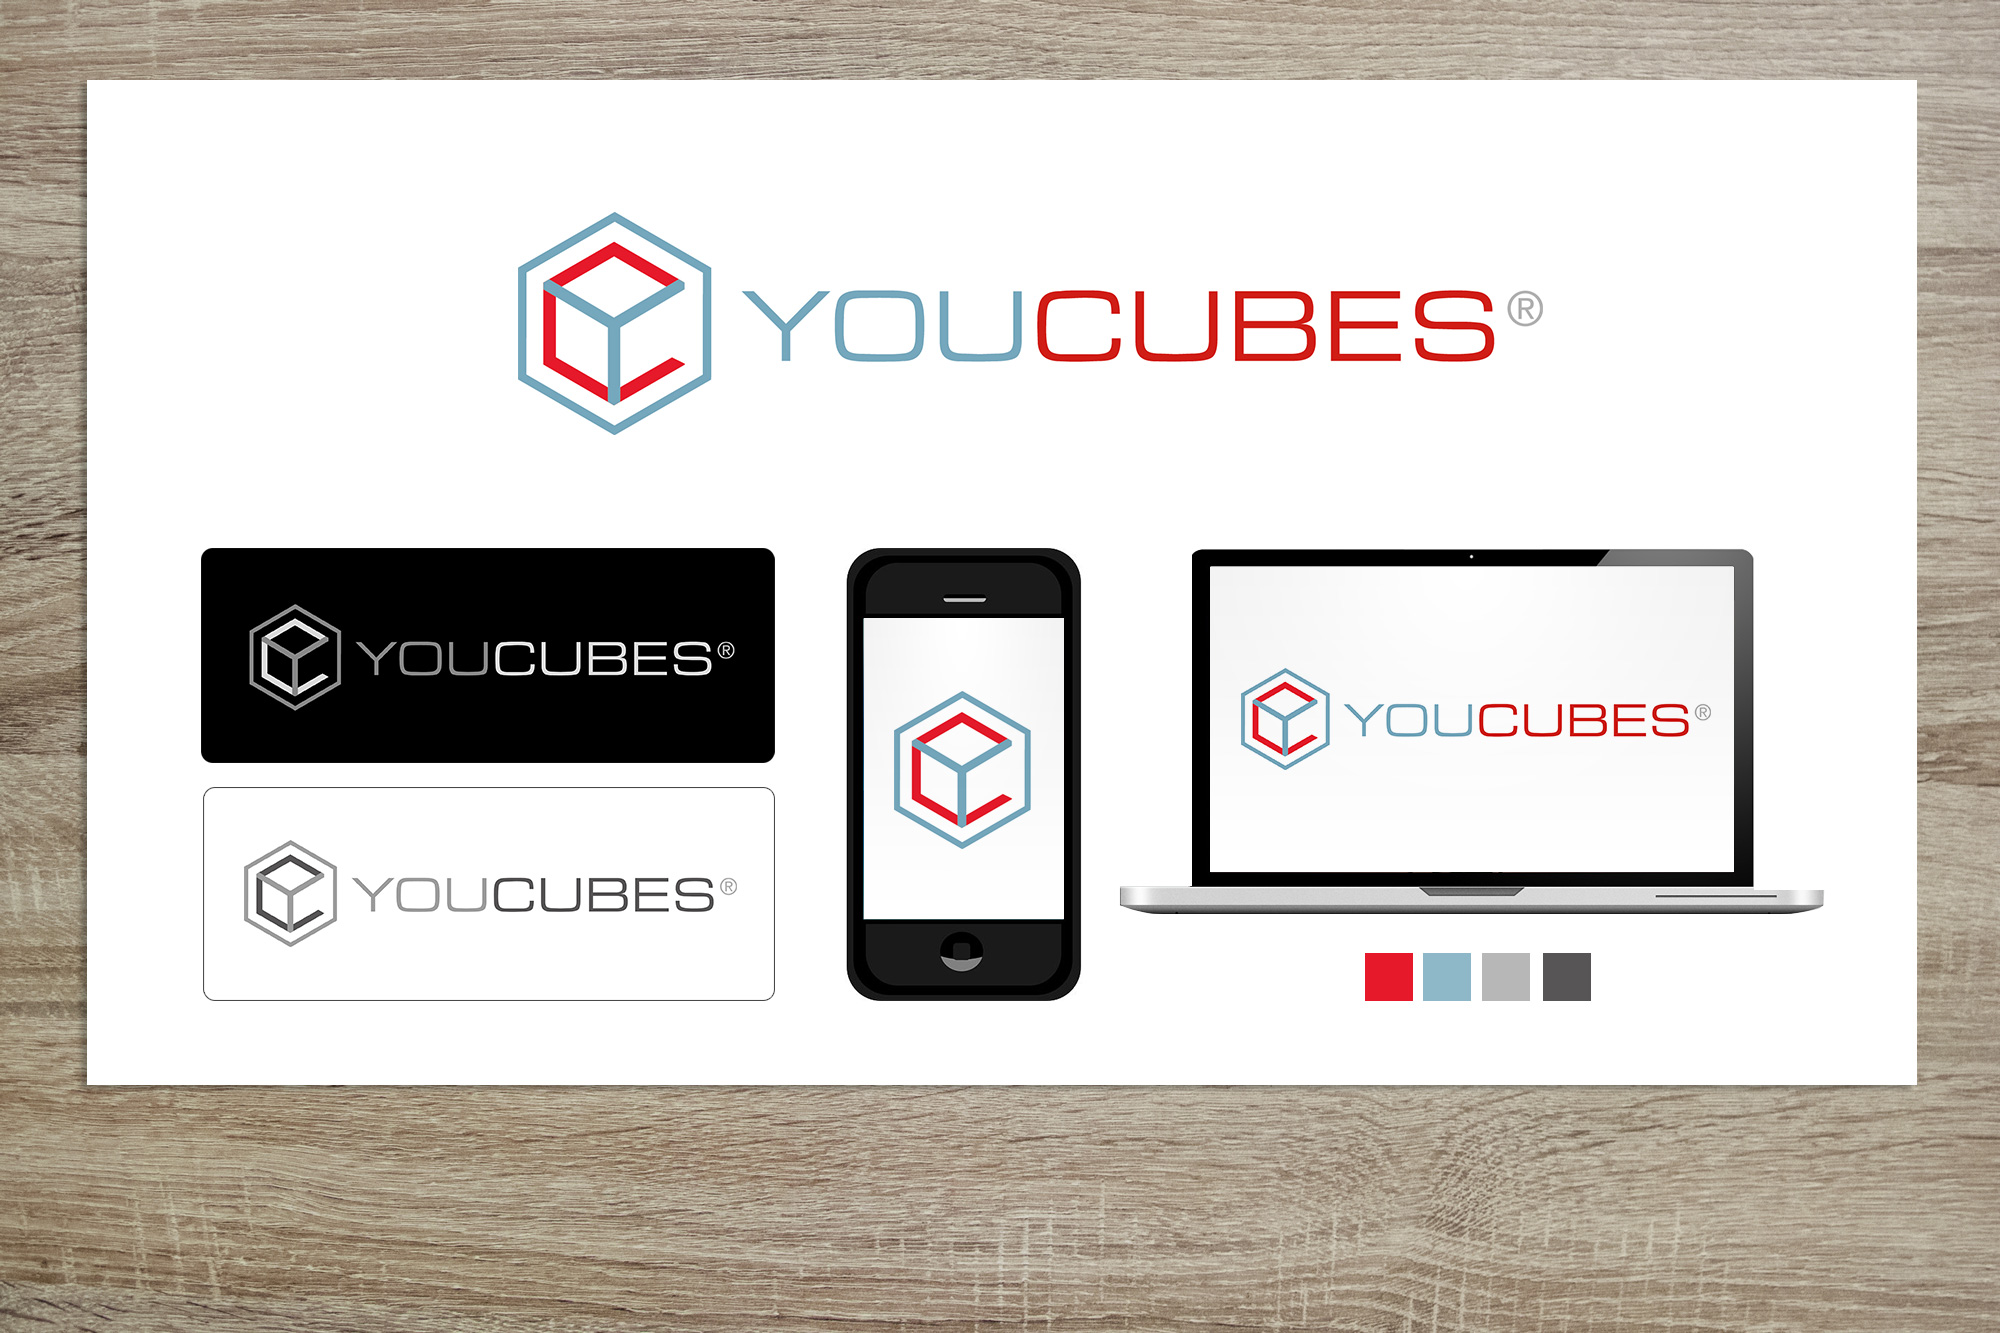 YouCubes